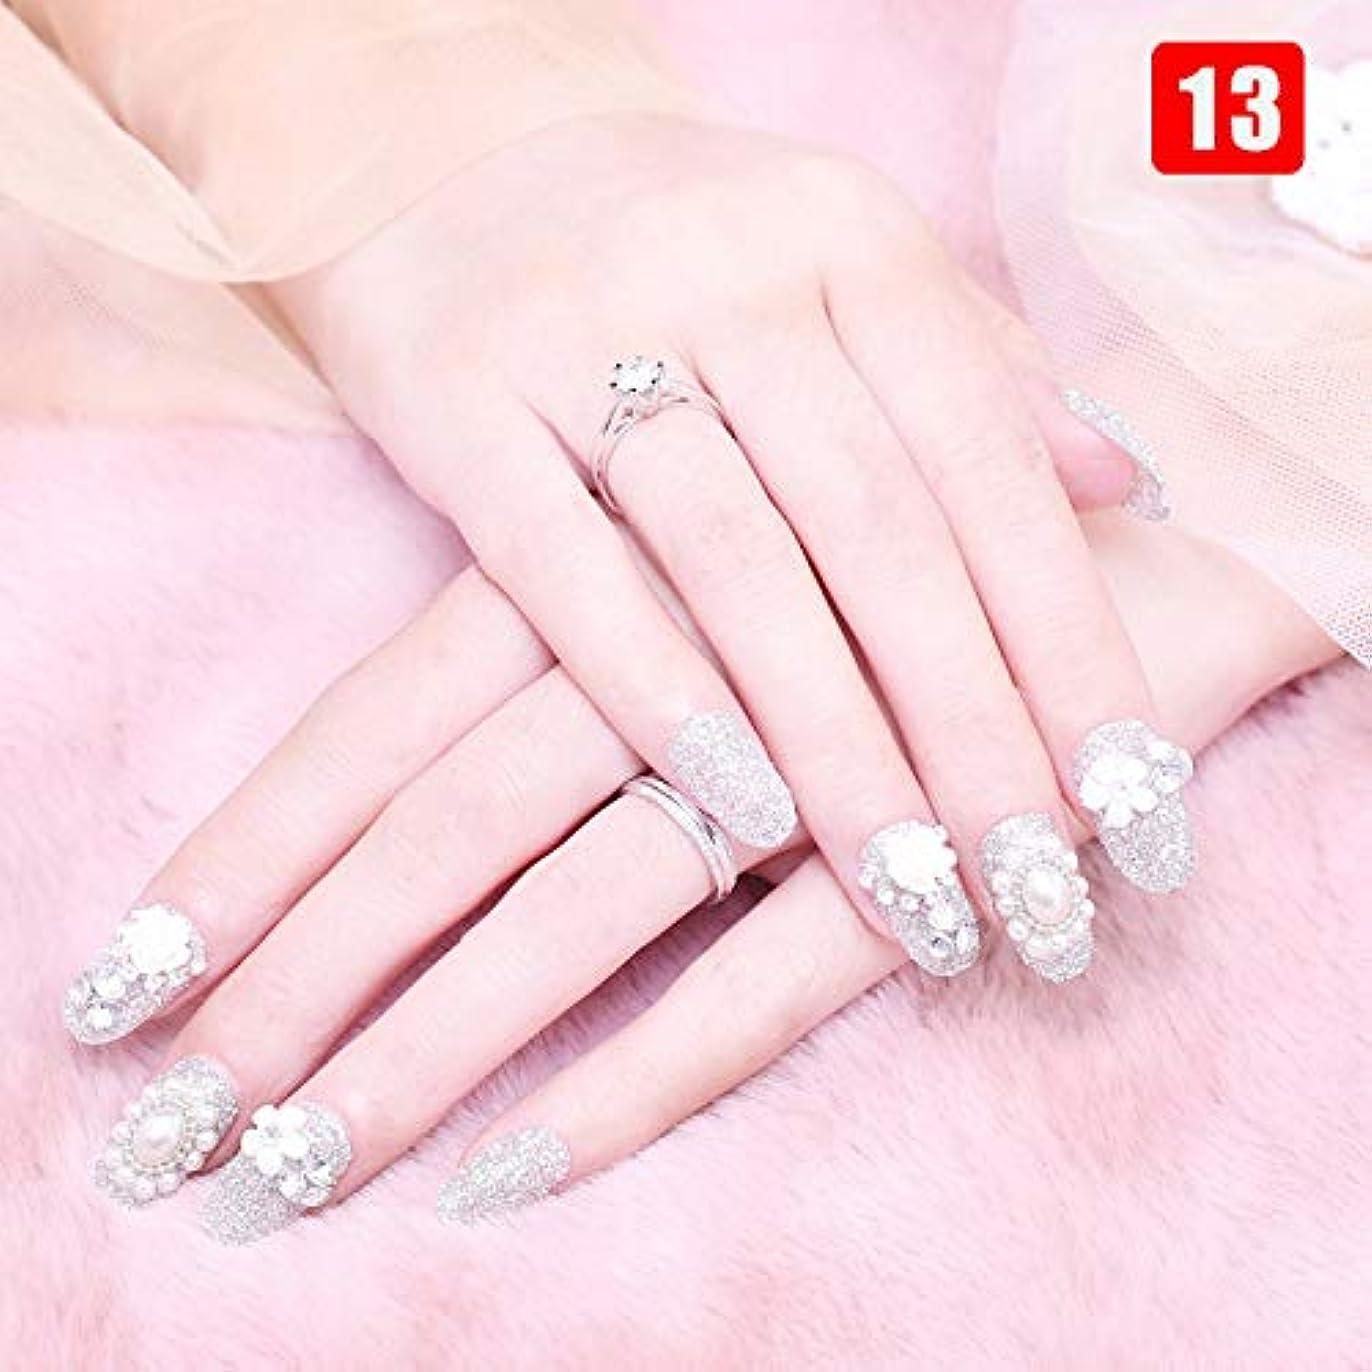 Happysource 24本の女性の偽の爪透明な花のビーズの装飾DIYの花嫁の偽の爪